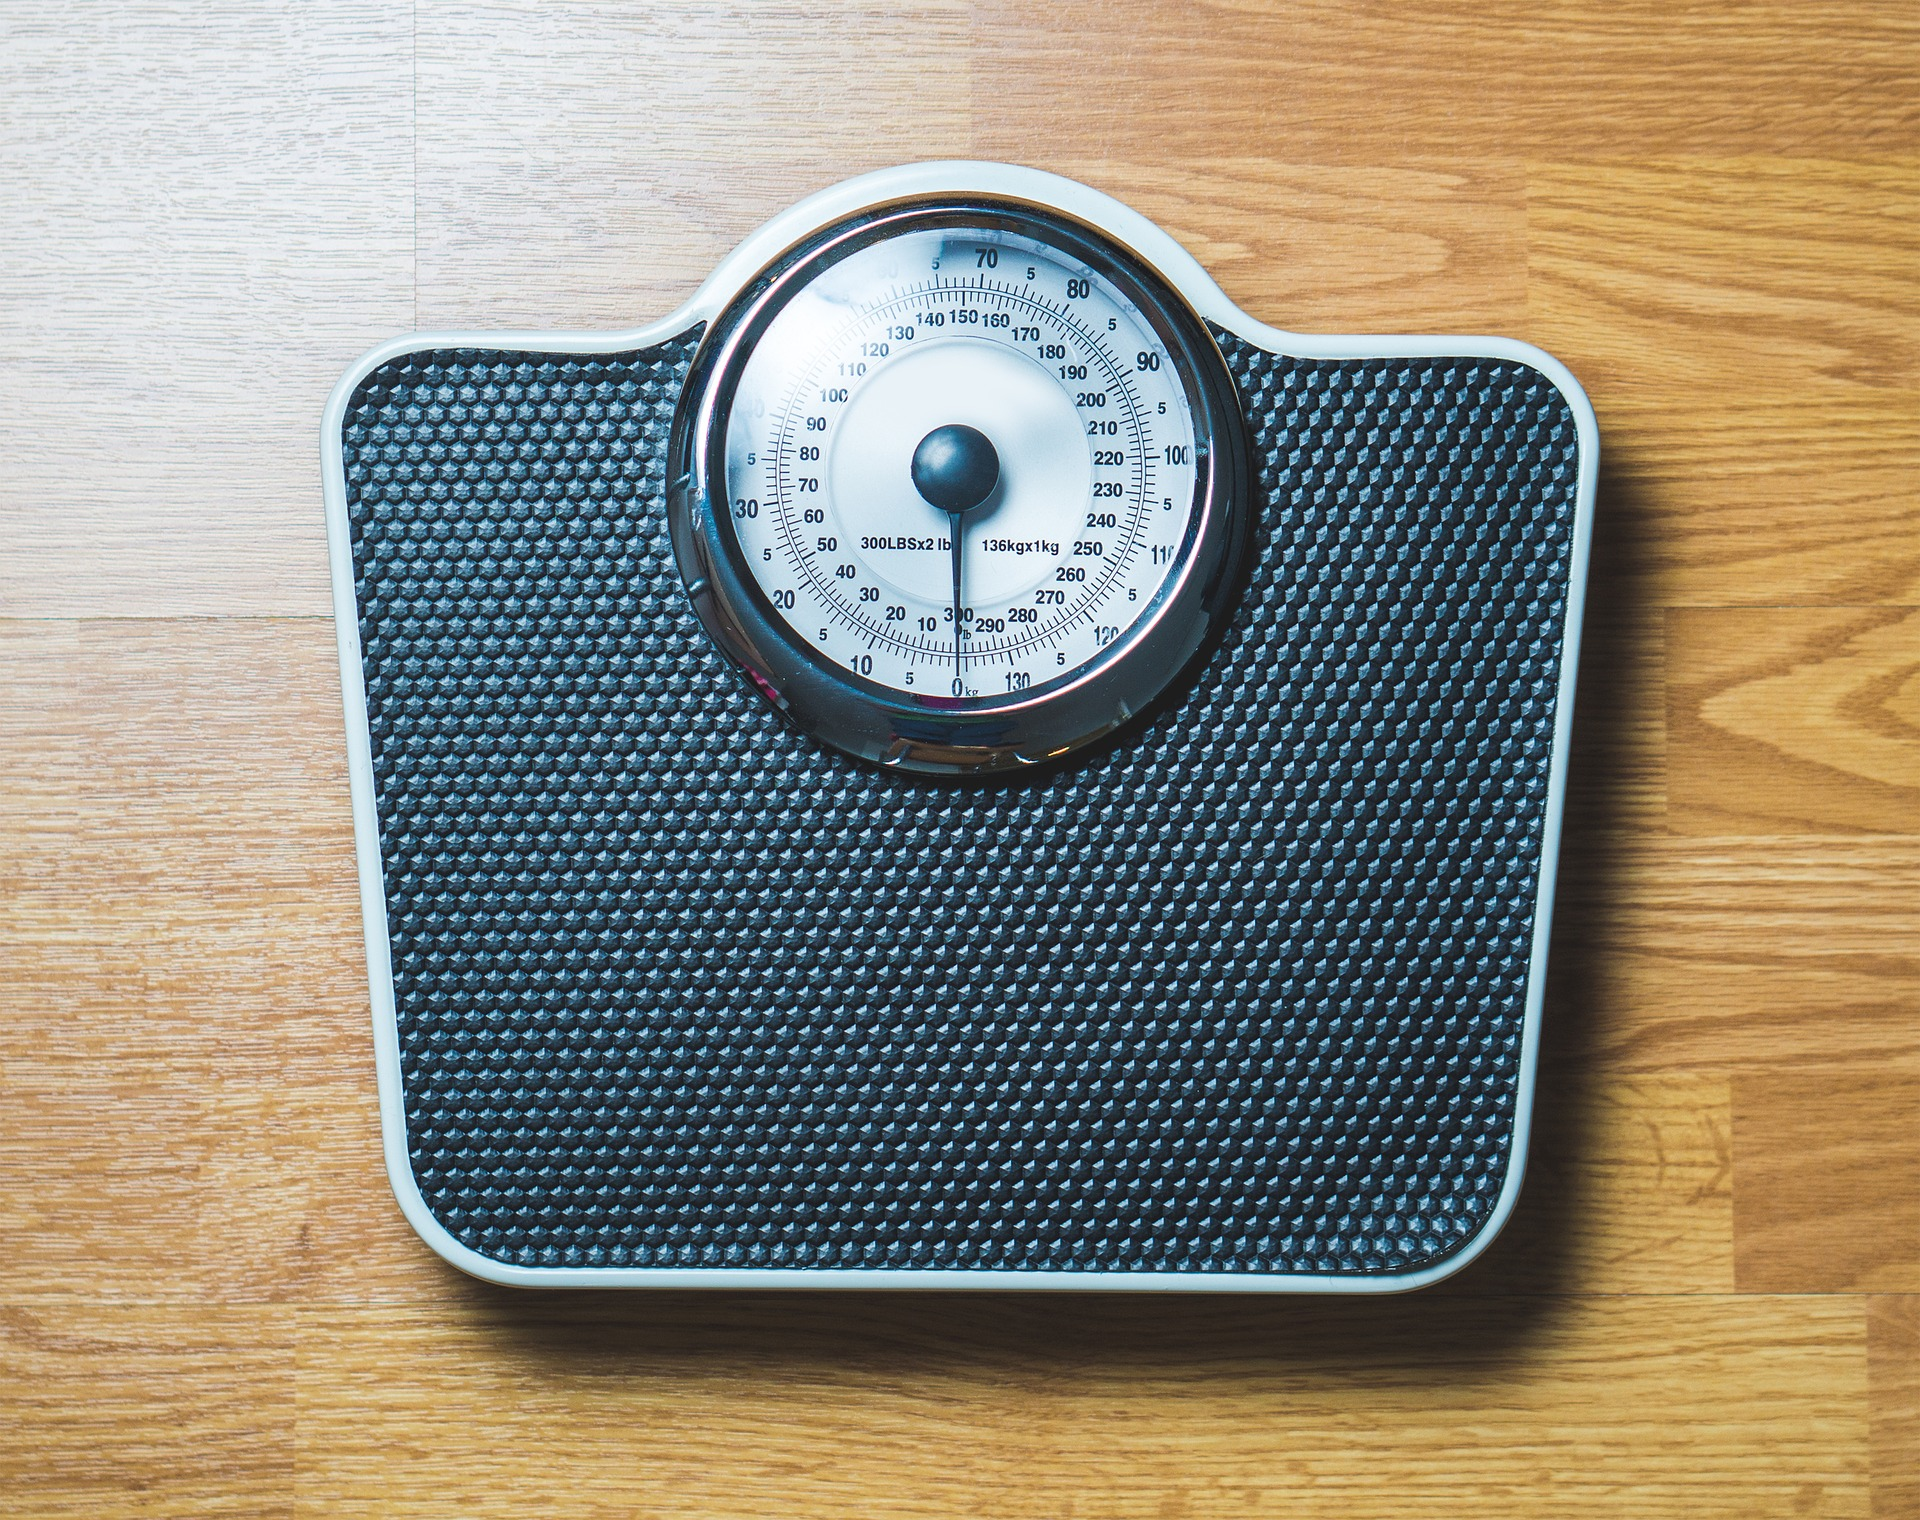 体重測定を毎晩実施